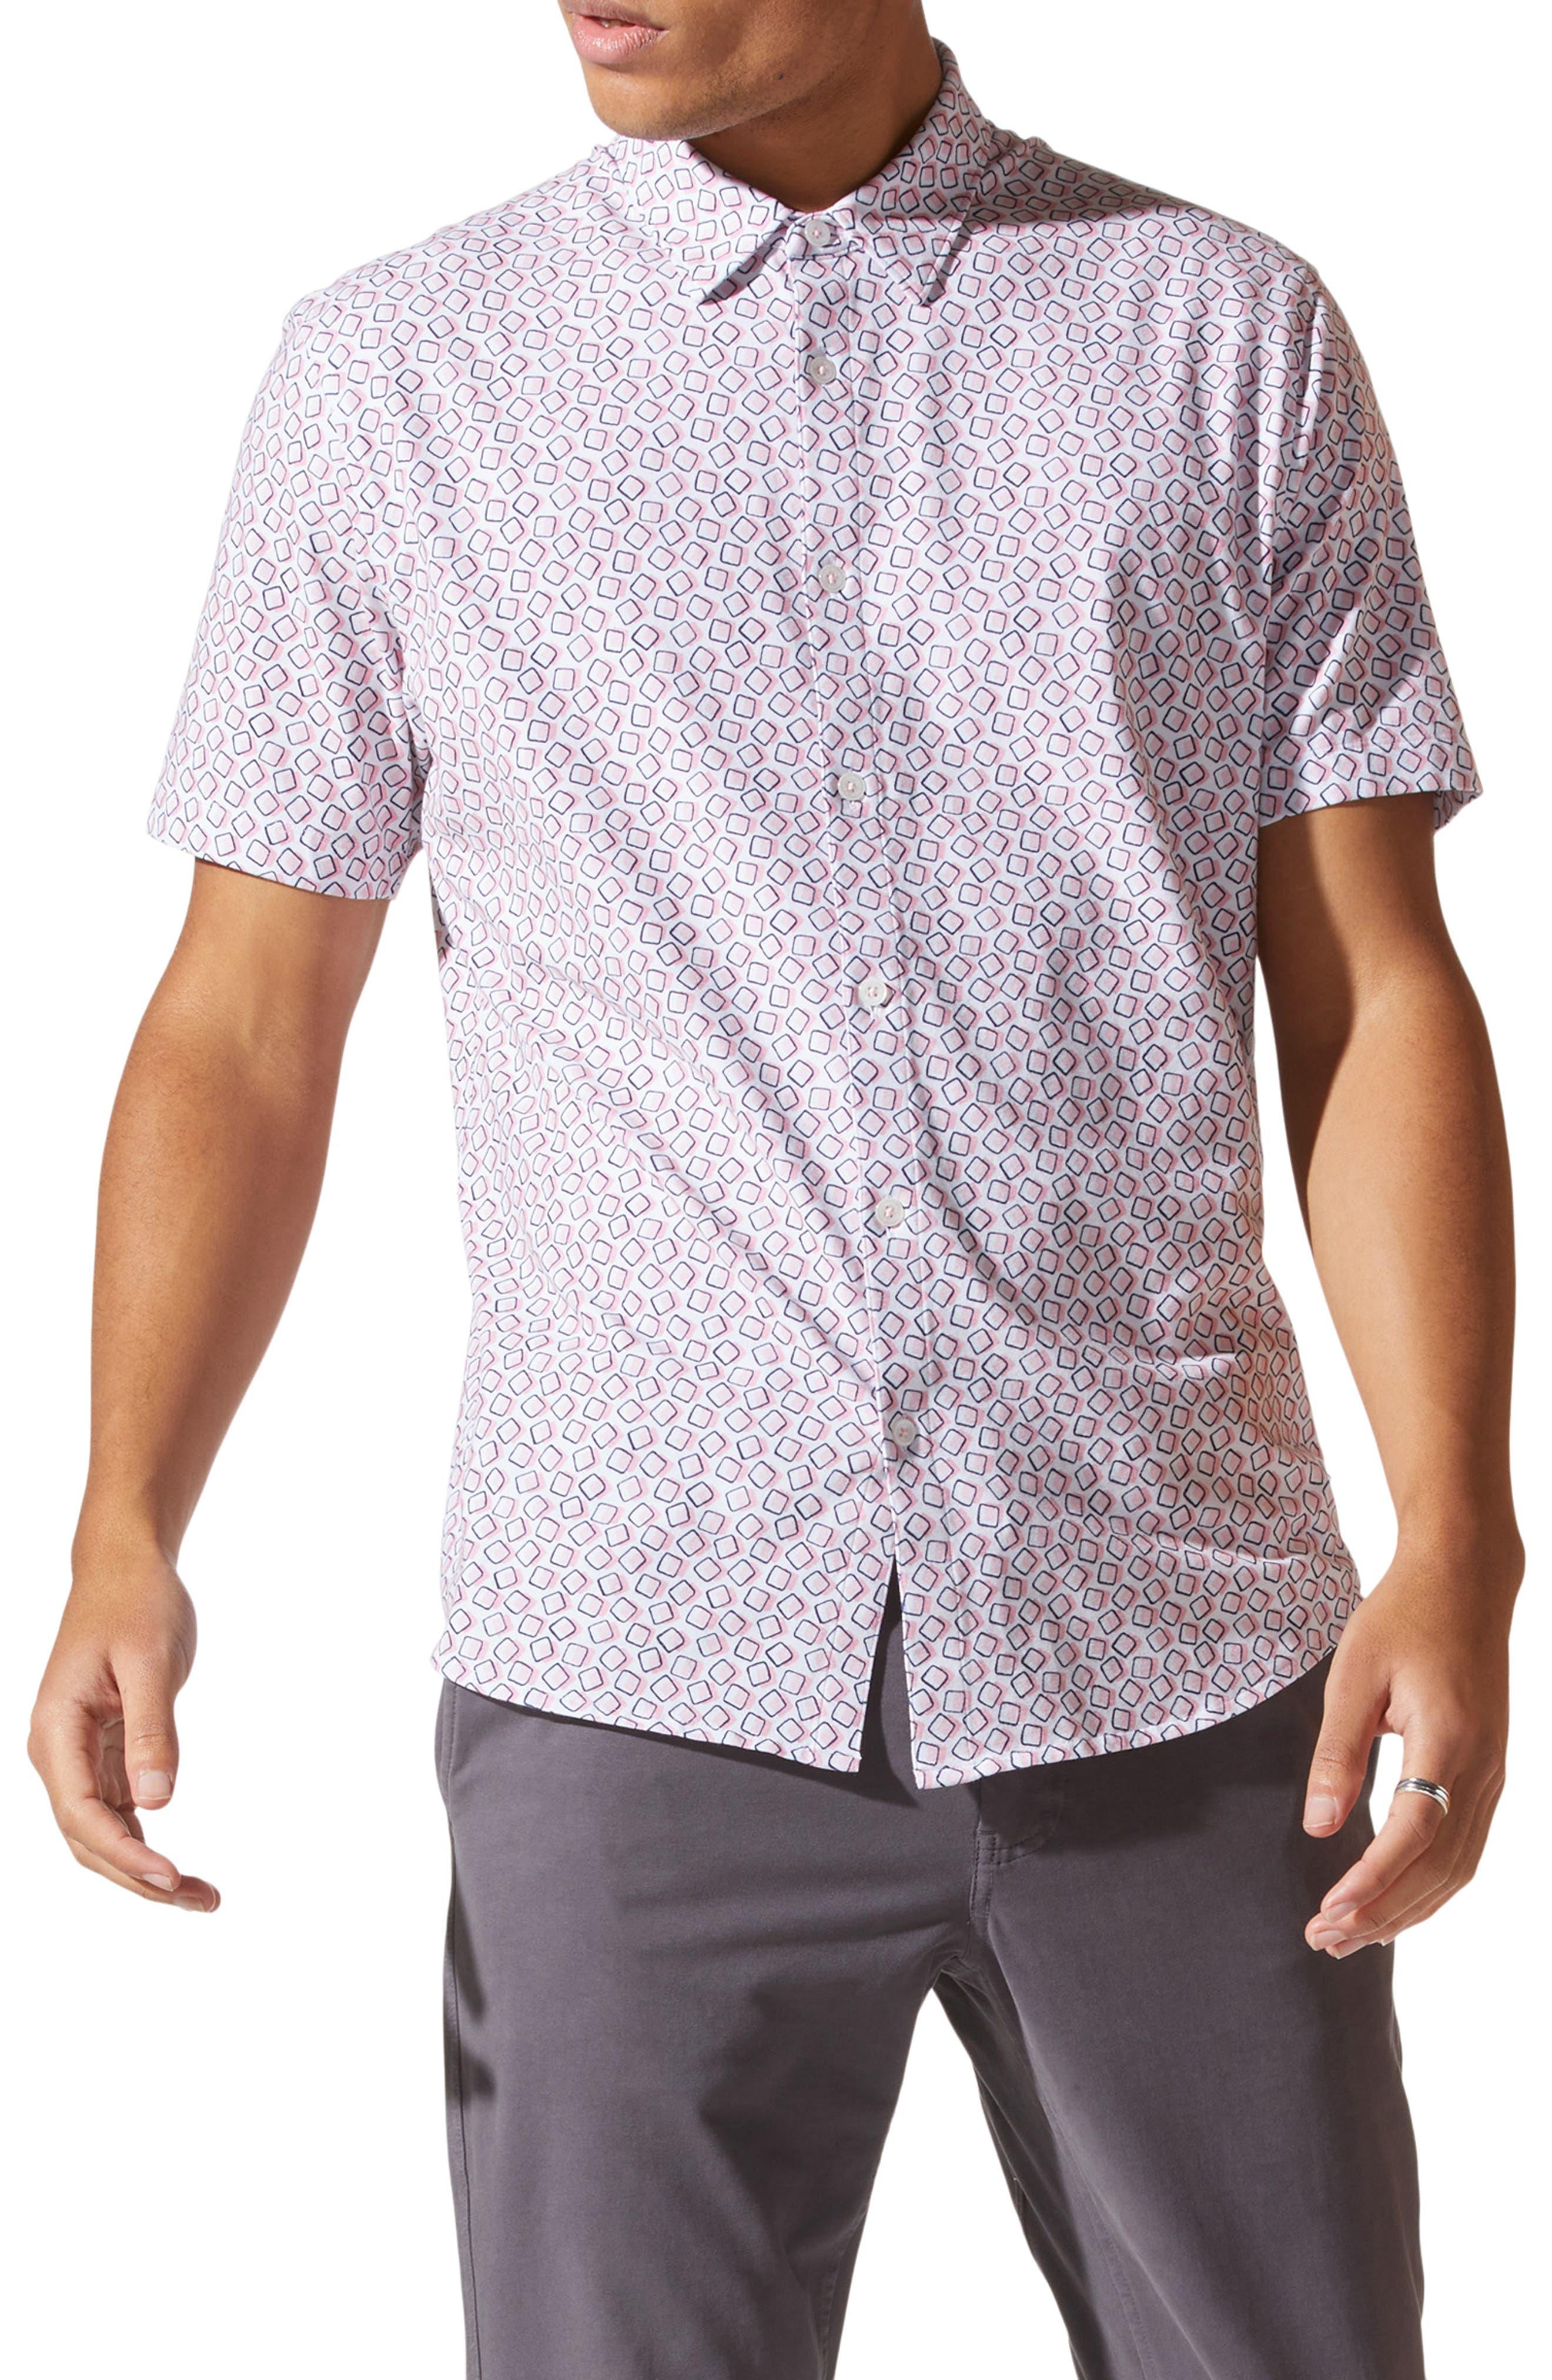 Flex Pro Slim Fit Print Short Sleeve Button-Up Shirt